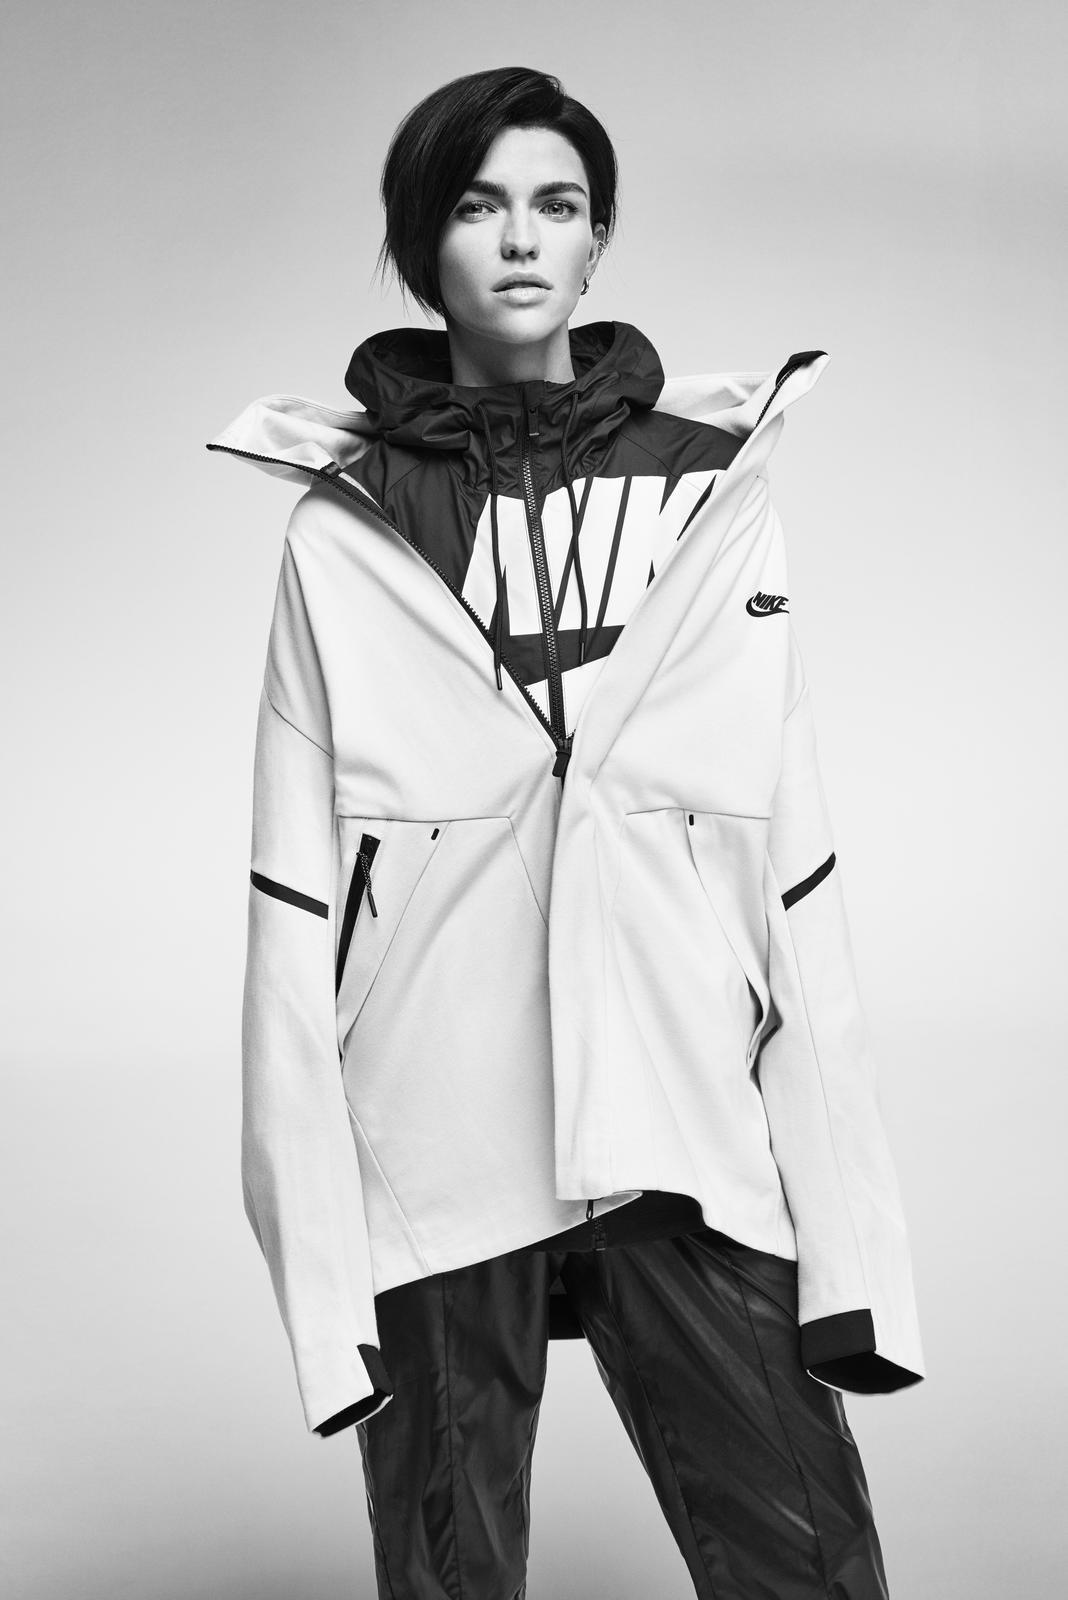 947a0cf0a8ad Nike Tech Pack FA17 4. Ruby Rose wears the Men s Nike Tech Fleece Repel  Windrunner ...